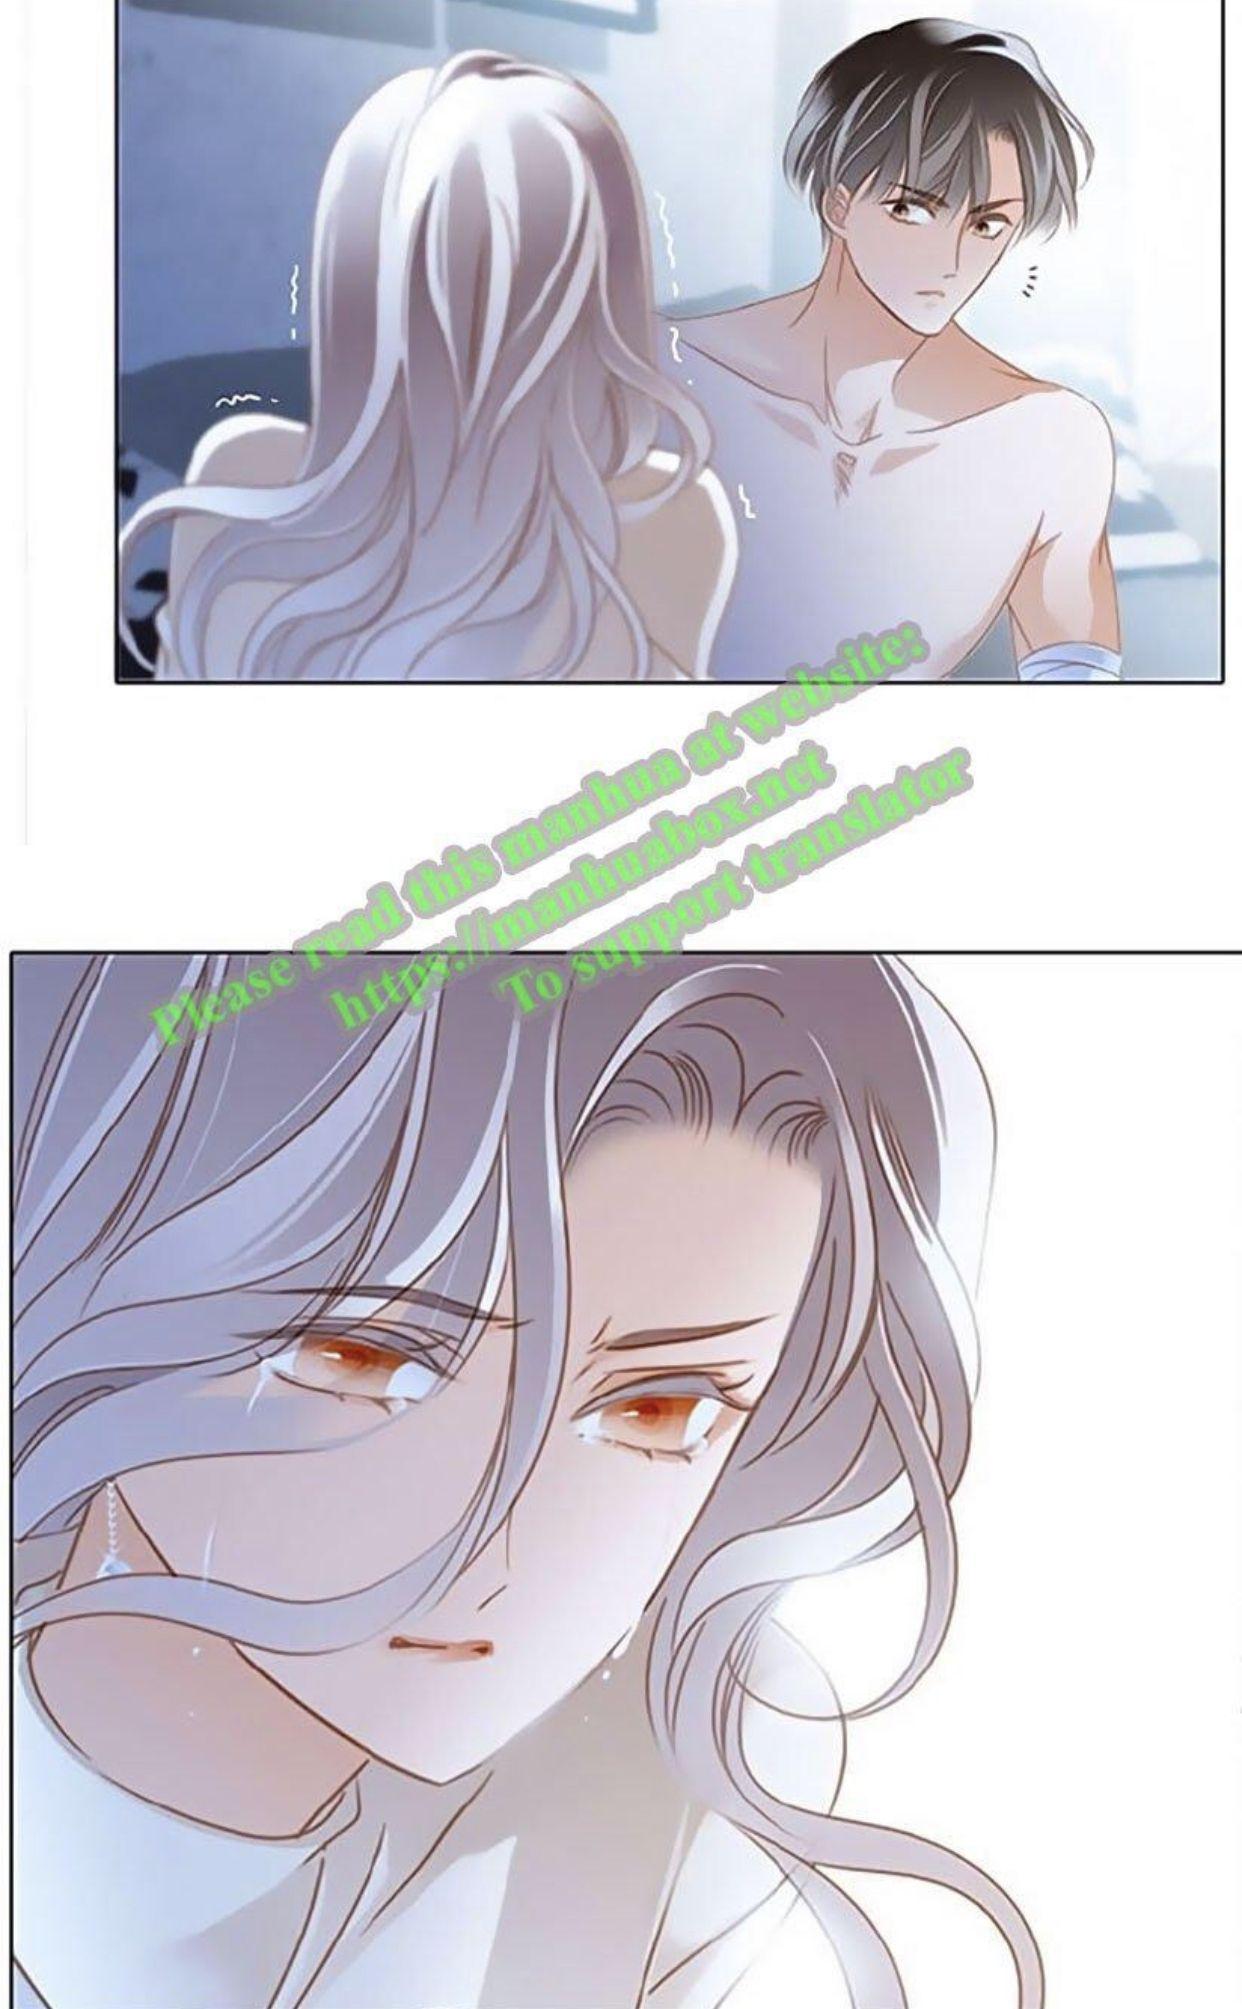 Ghim của Animemangaluver trên 1st Kiss I Don't Want To